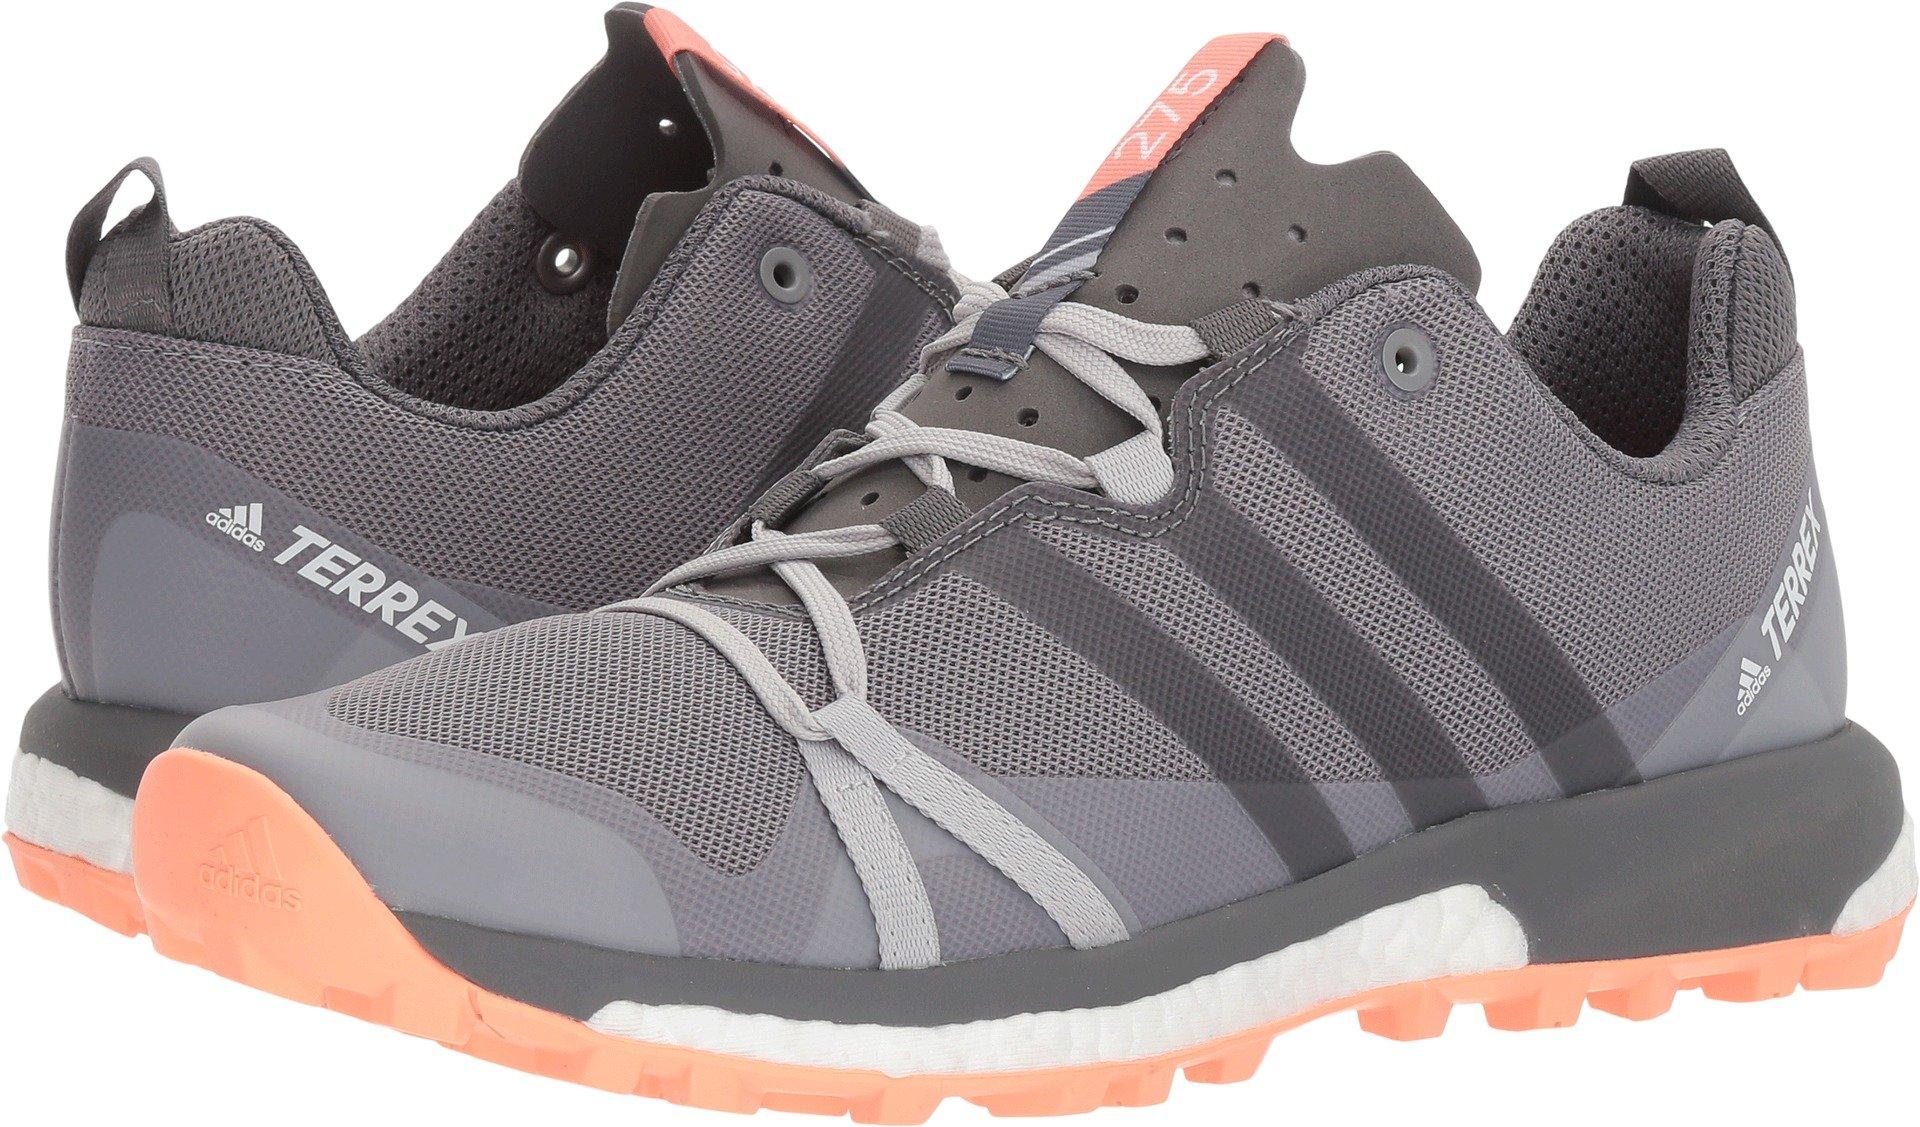 Adidas Sport Performance Women's Terrex Agravic W Sneakers, Grey, 6 M